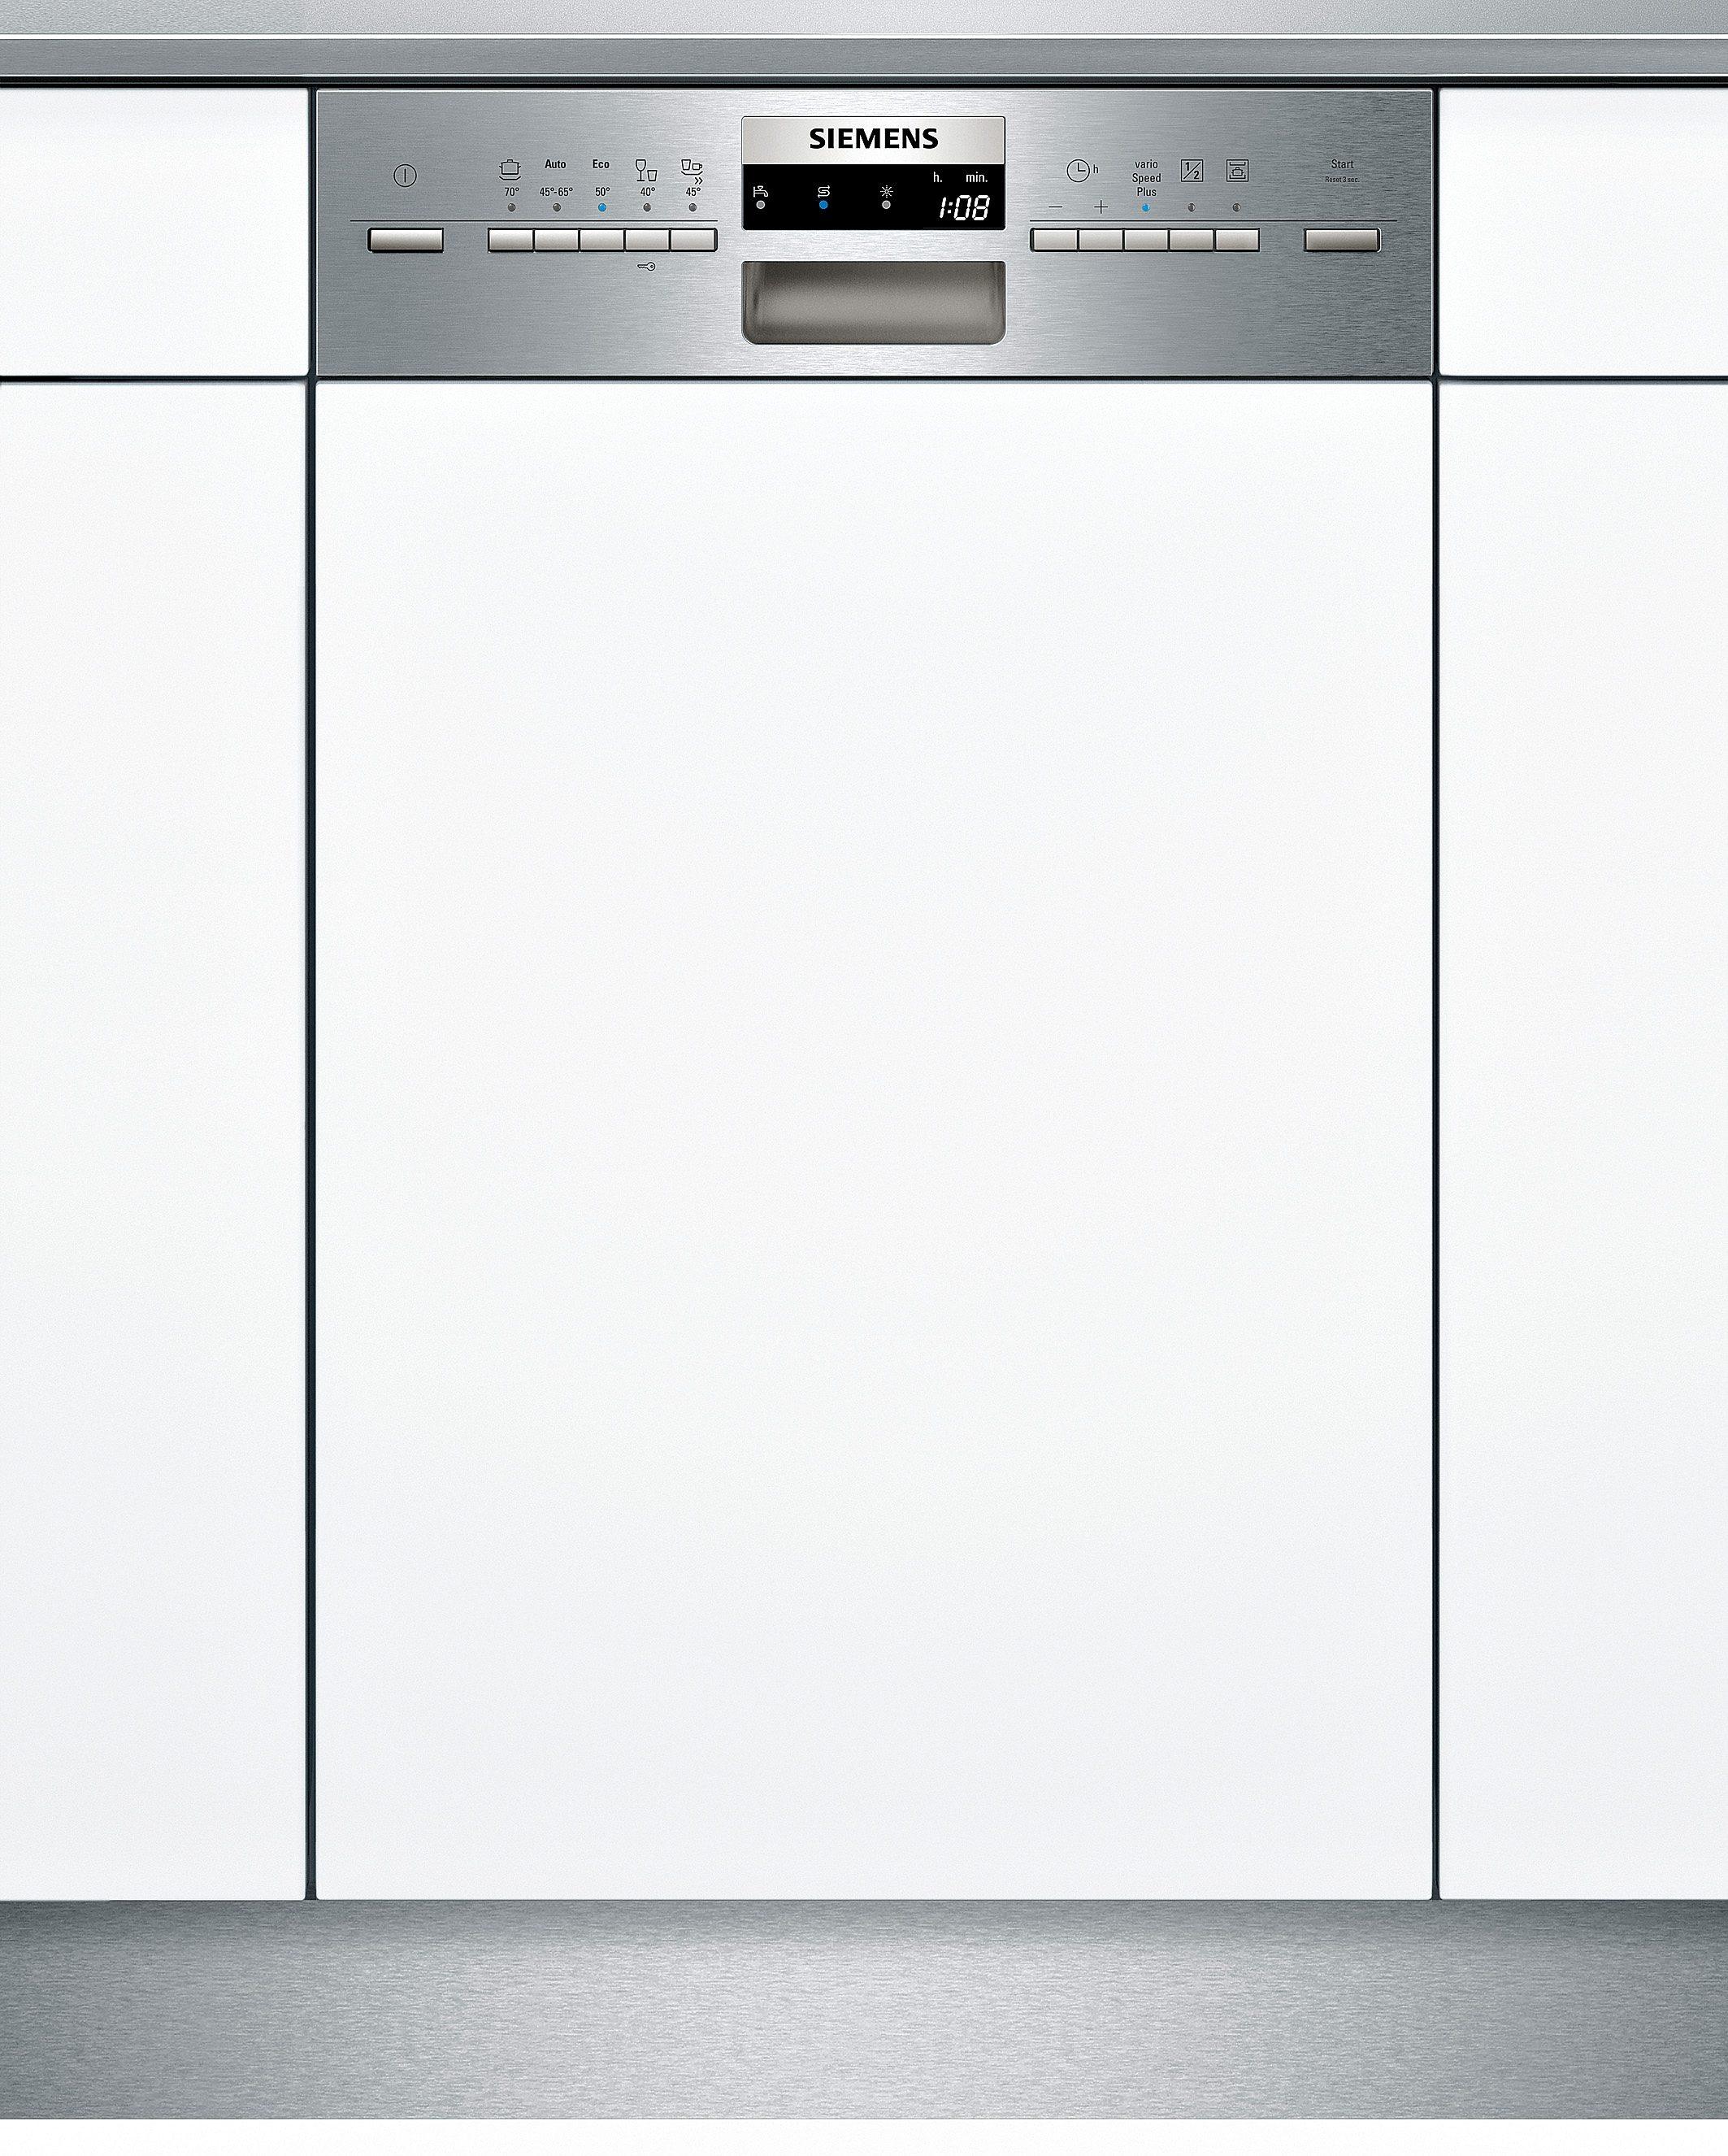 Siemens integrierbarer Einbaugeschirrspüler SR55M586EU, Energieklasse A+, 9,5 Liter, 10 Maßgedecke